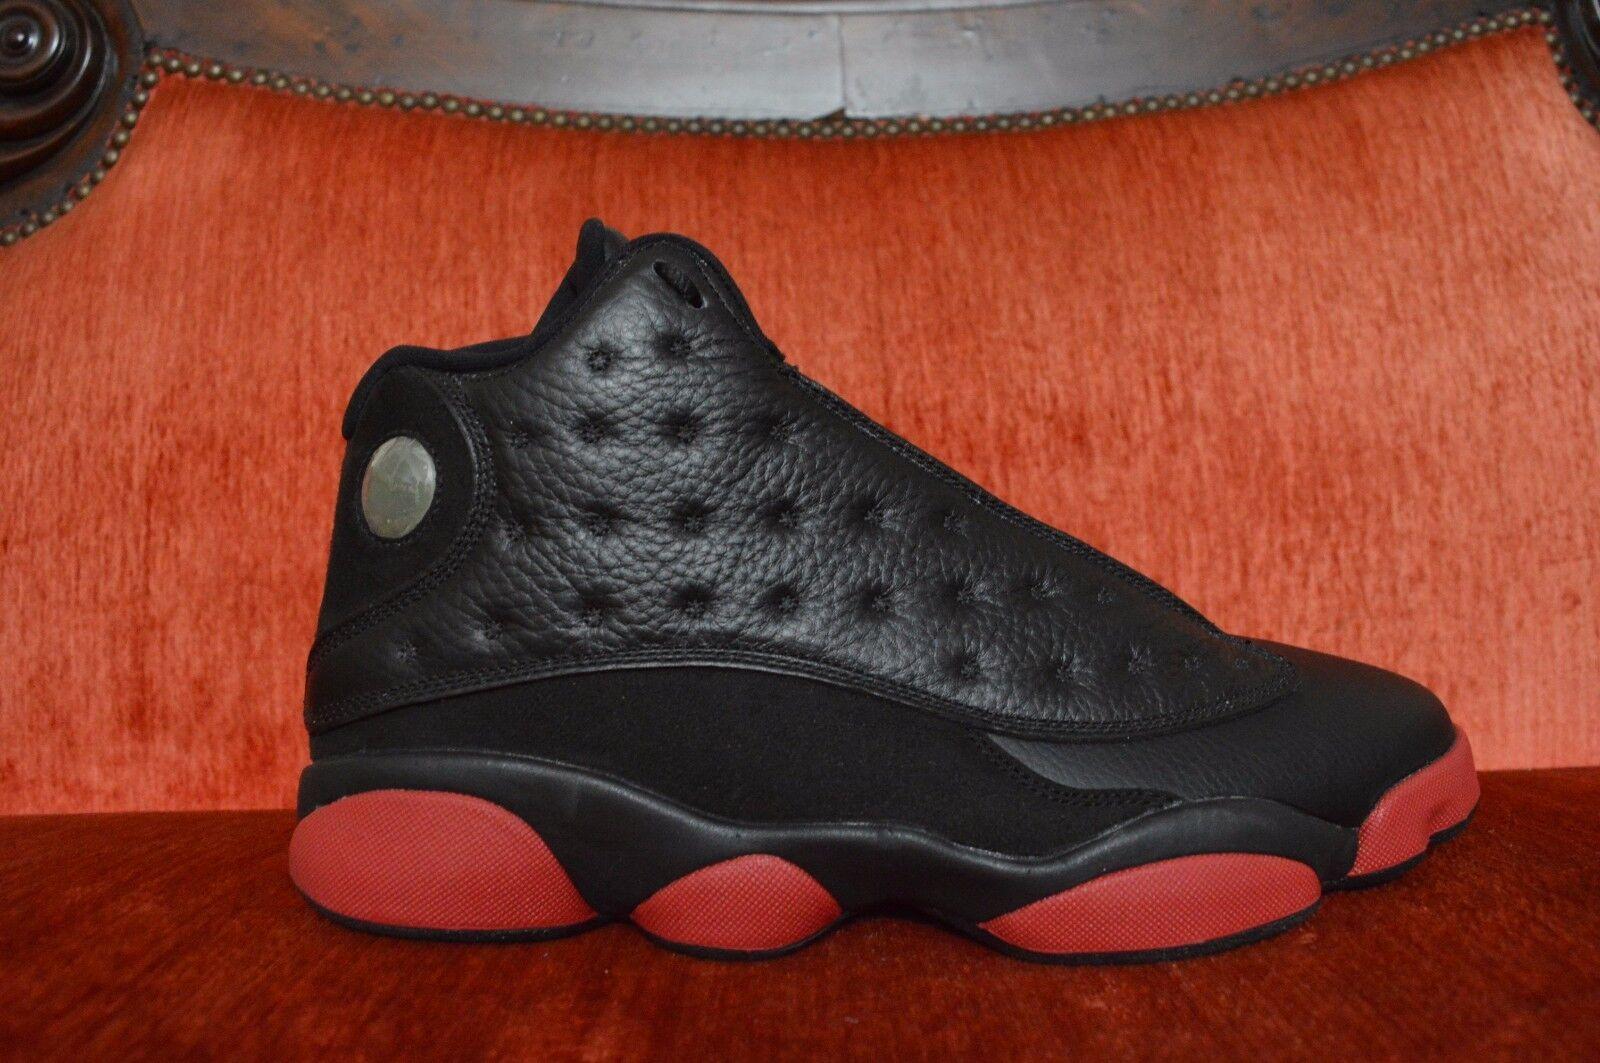 NIKE AIR JORDAN 13 XIII RETRO Dirty Bred Black Gym Red Nike 414571-003 Size 11